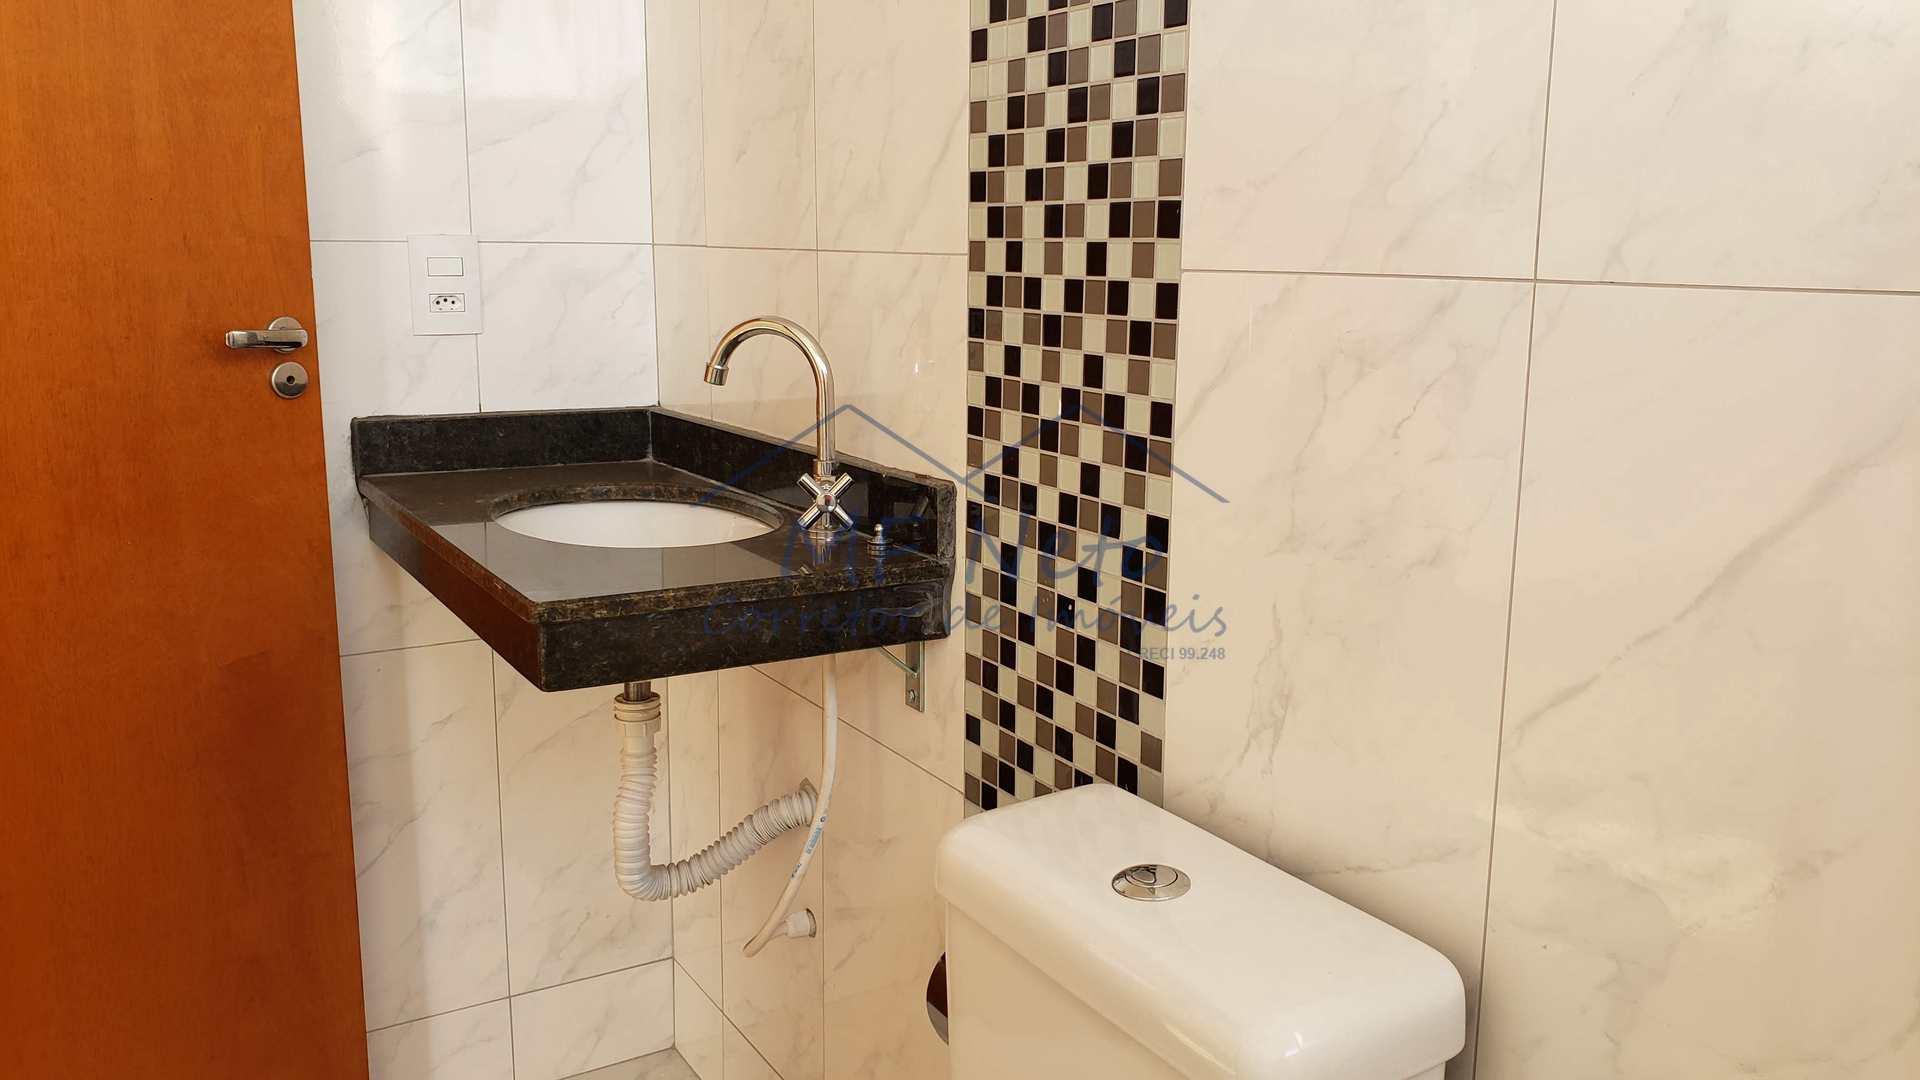 Apartamento com 3 dorms, Jardim Carlos Gomes, Pirassununga - R$ 350 mil, Cod: 10131684